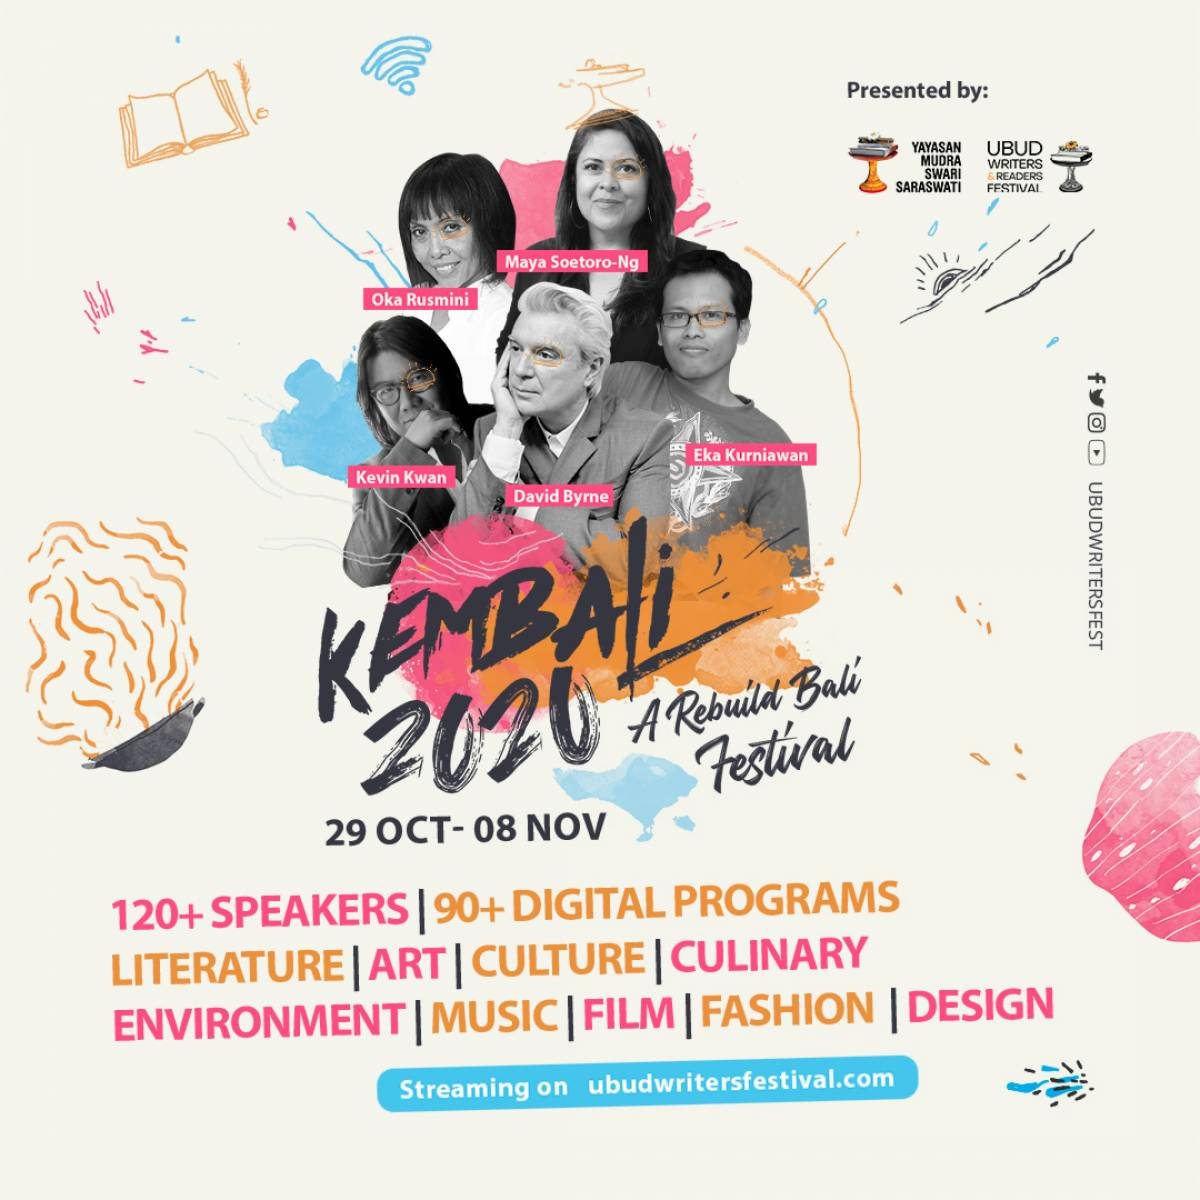 Kembali 2020 - A Digital Arts Festival to Rebuild Bali's Creative Community